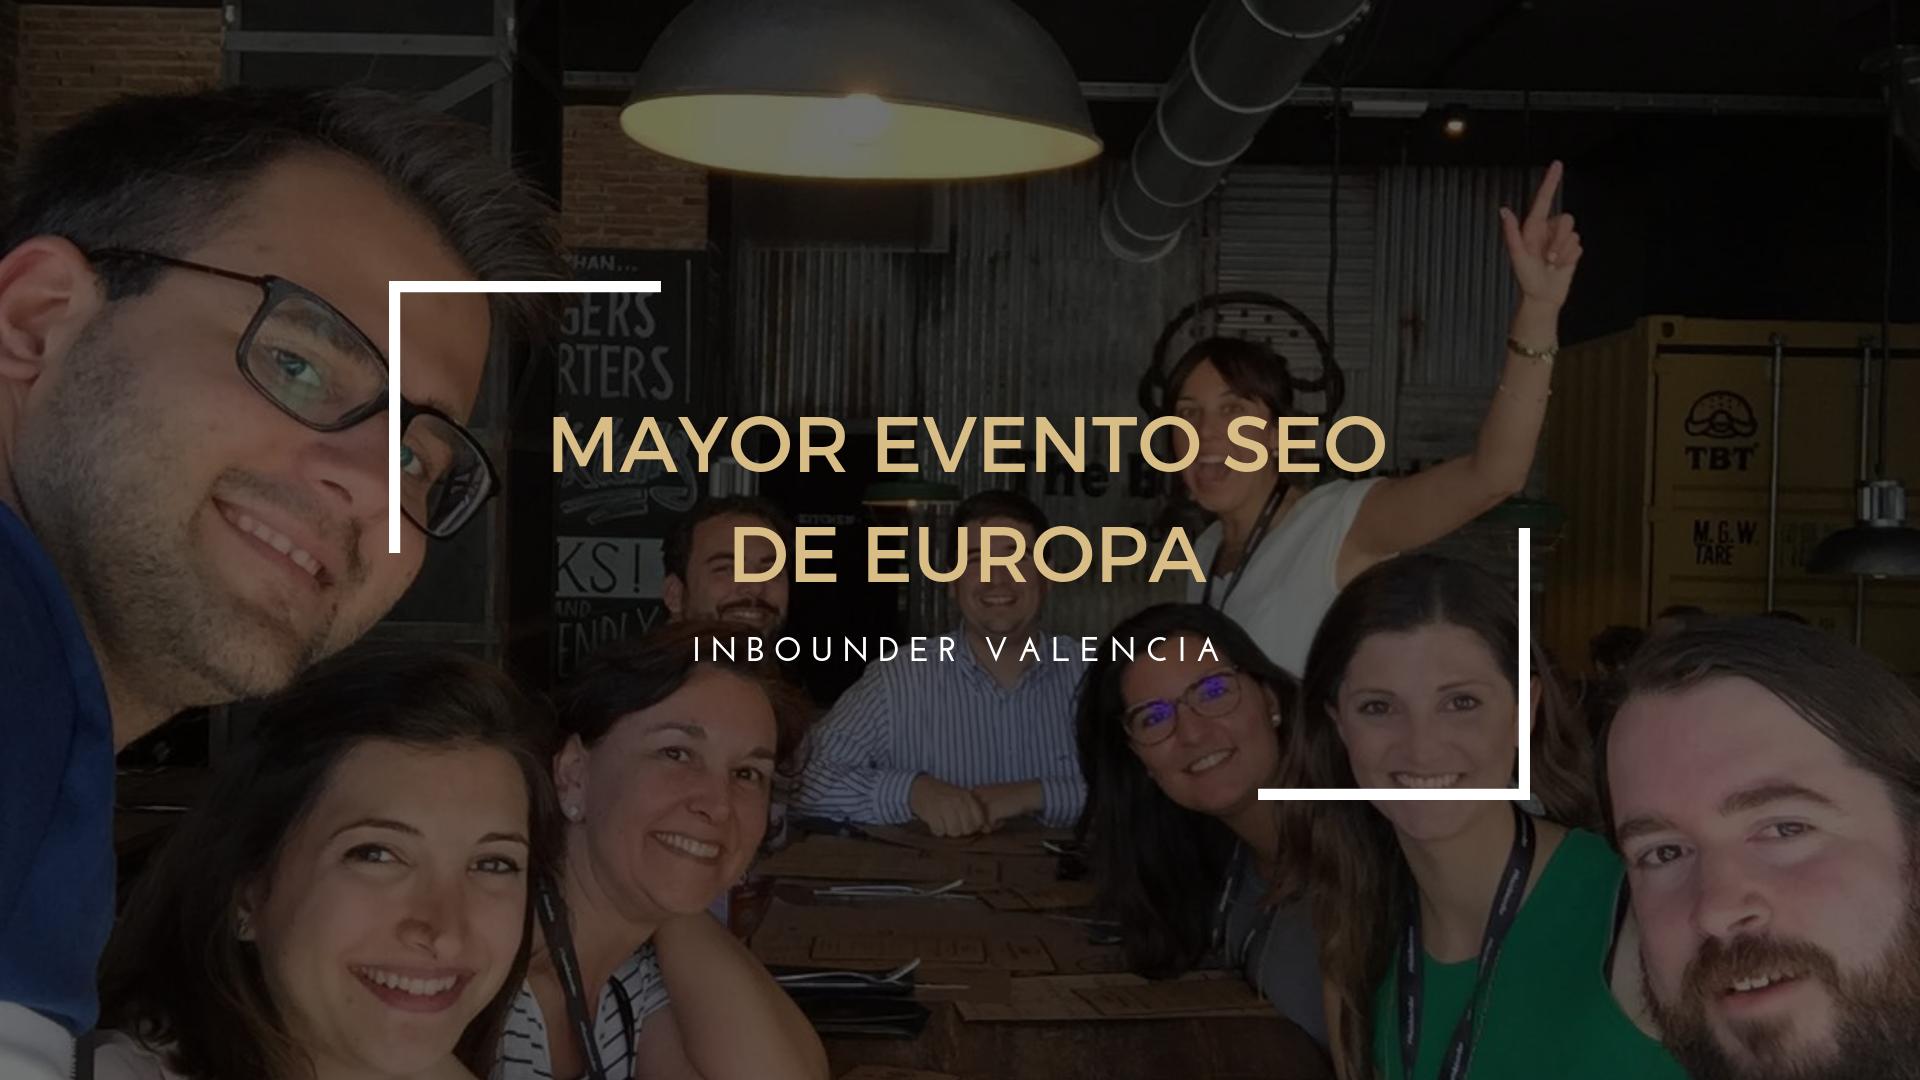 El Mayor evento SEO de Europa e IMPRESIONA.net en primera fila ( Inbounder Valencia)